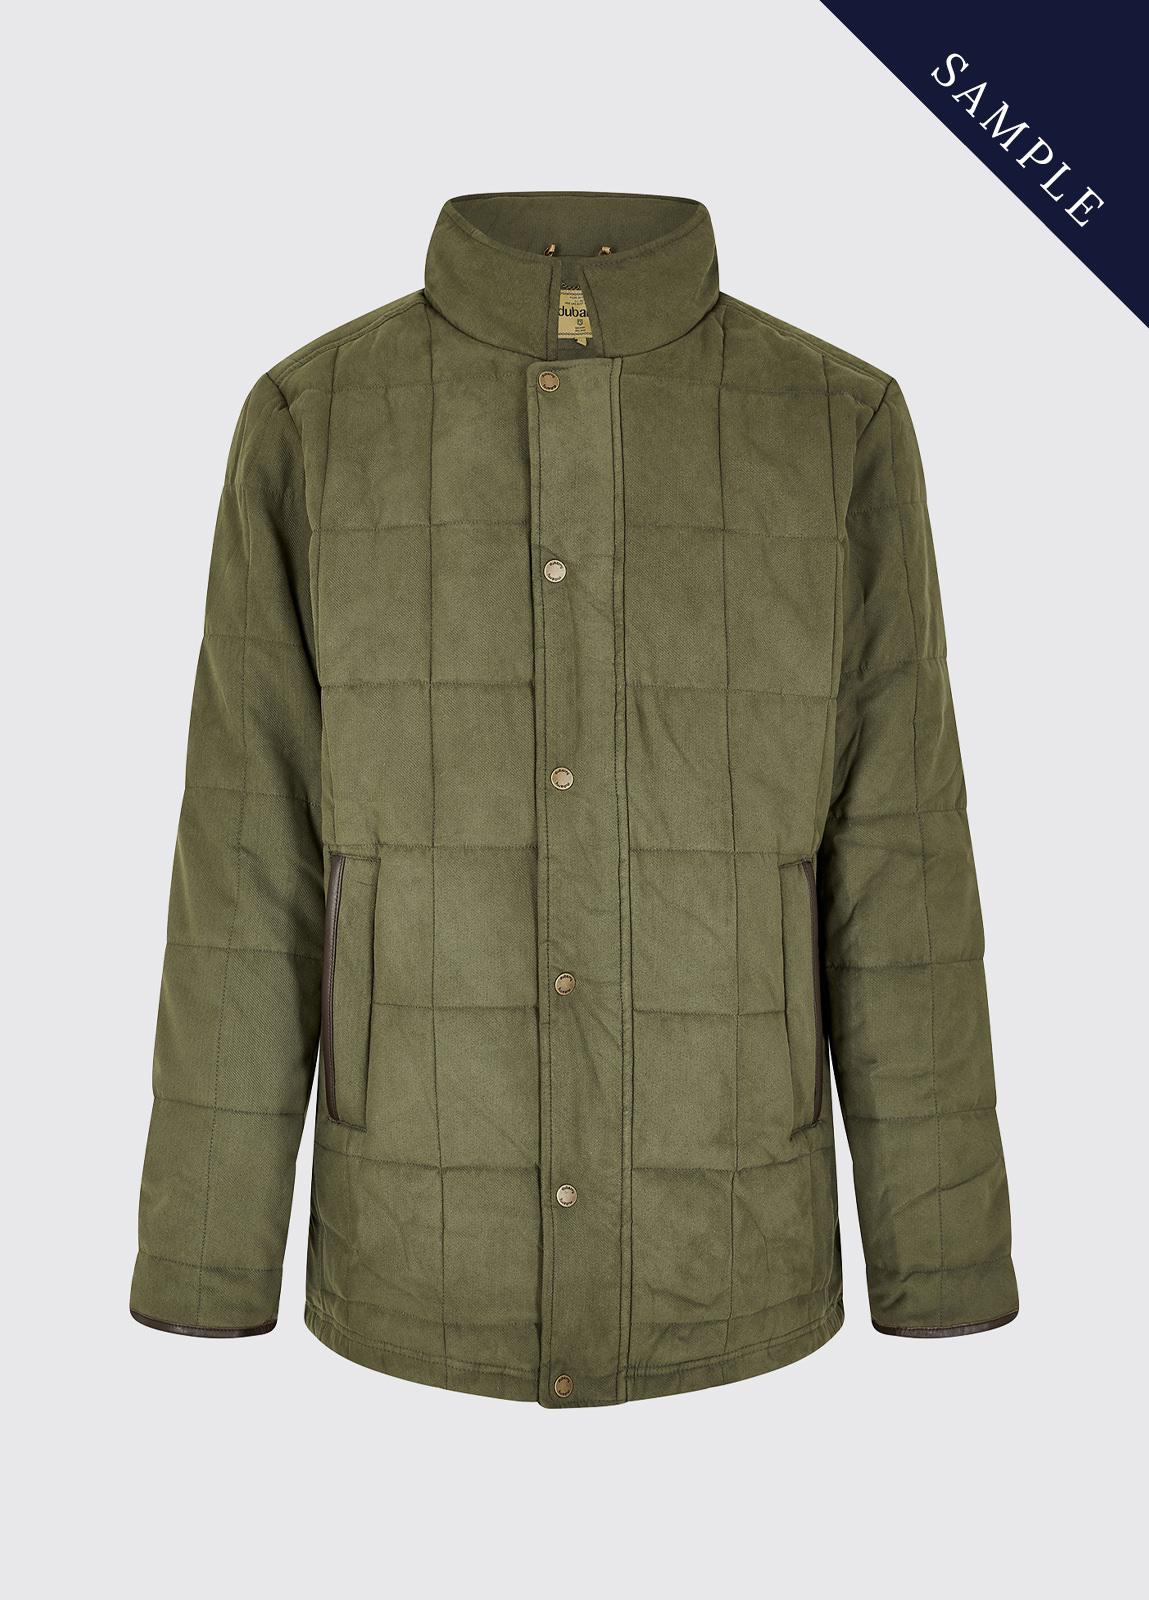 Dunboyne - Dusky Green - Size Medium